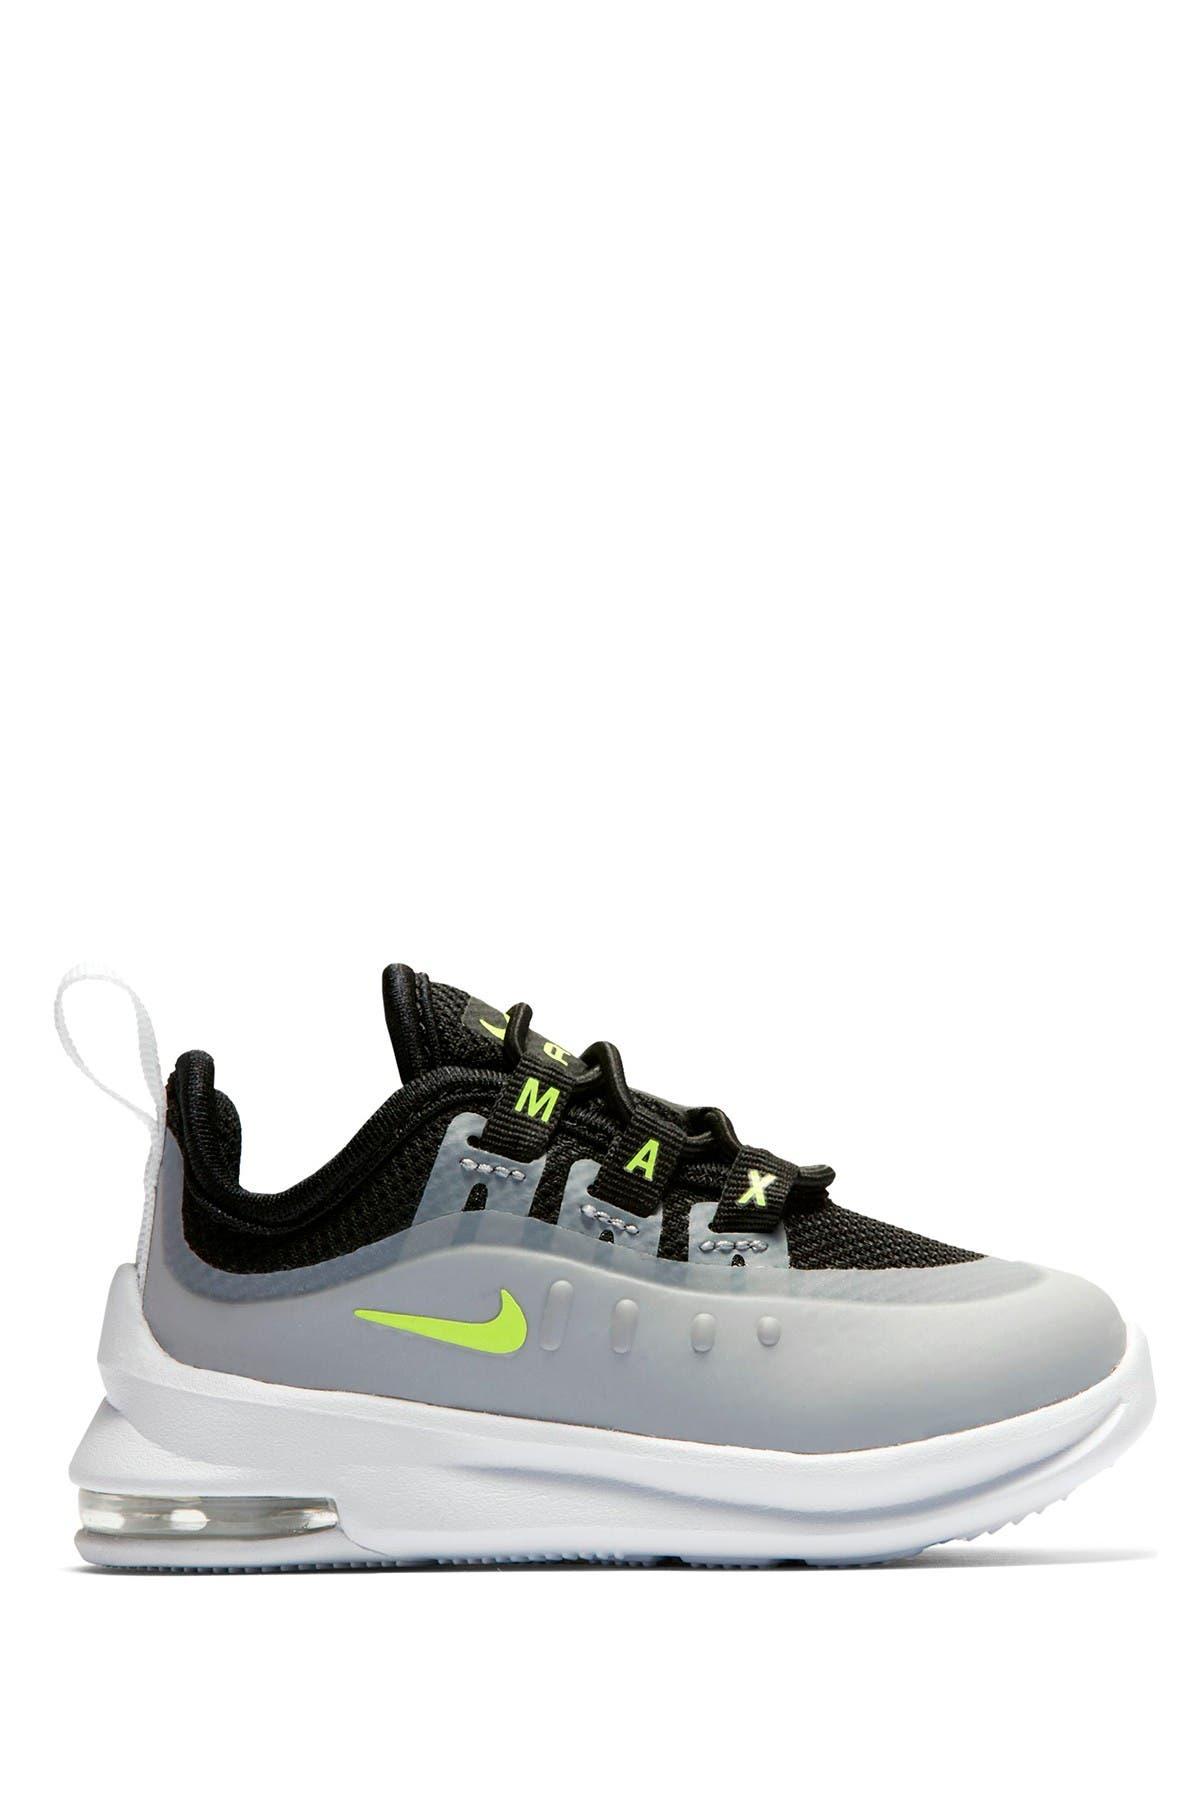 Nike   Air Max Axis Sneaker   Nordstrom